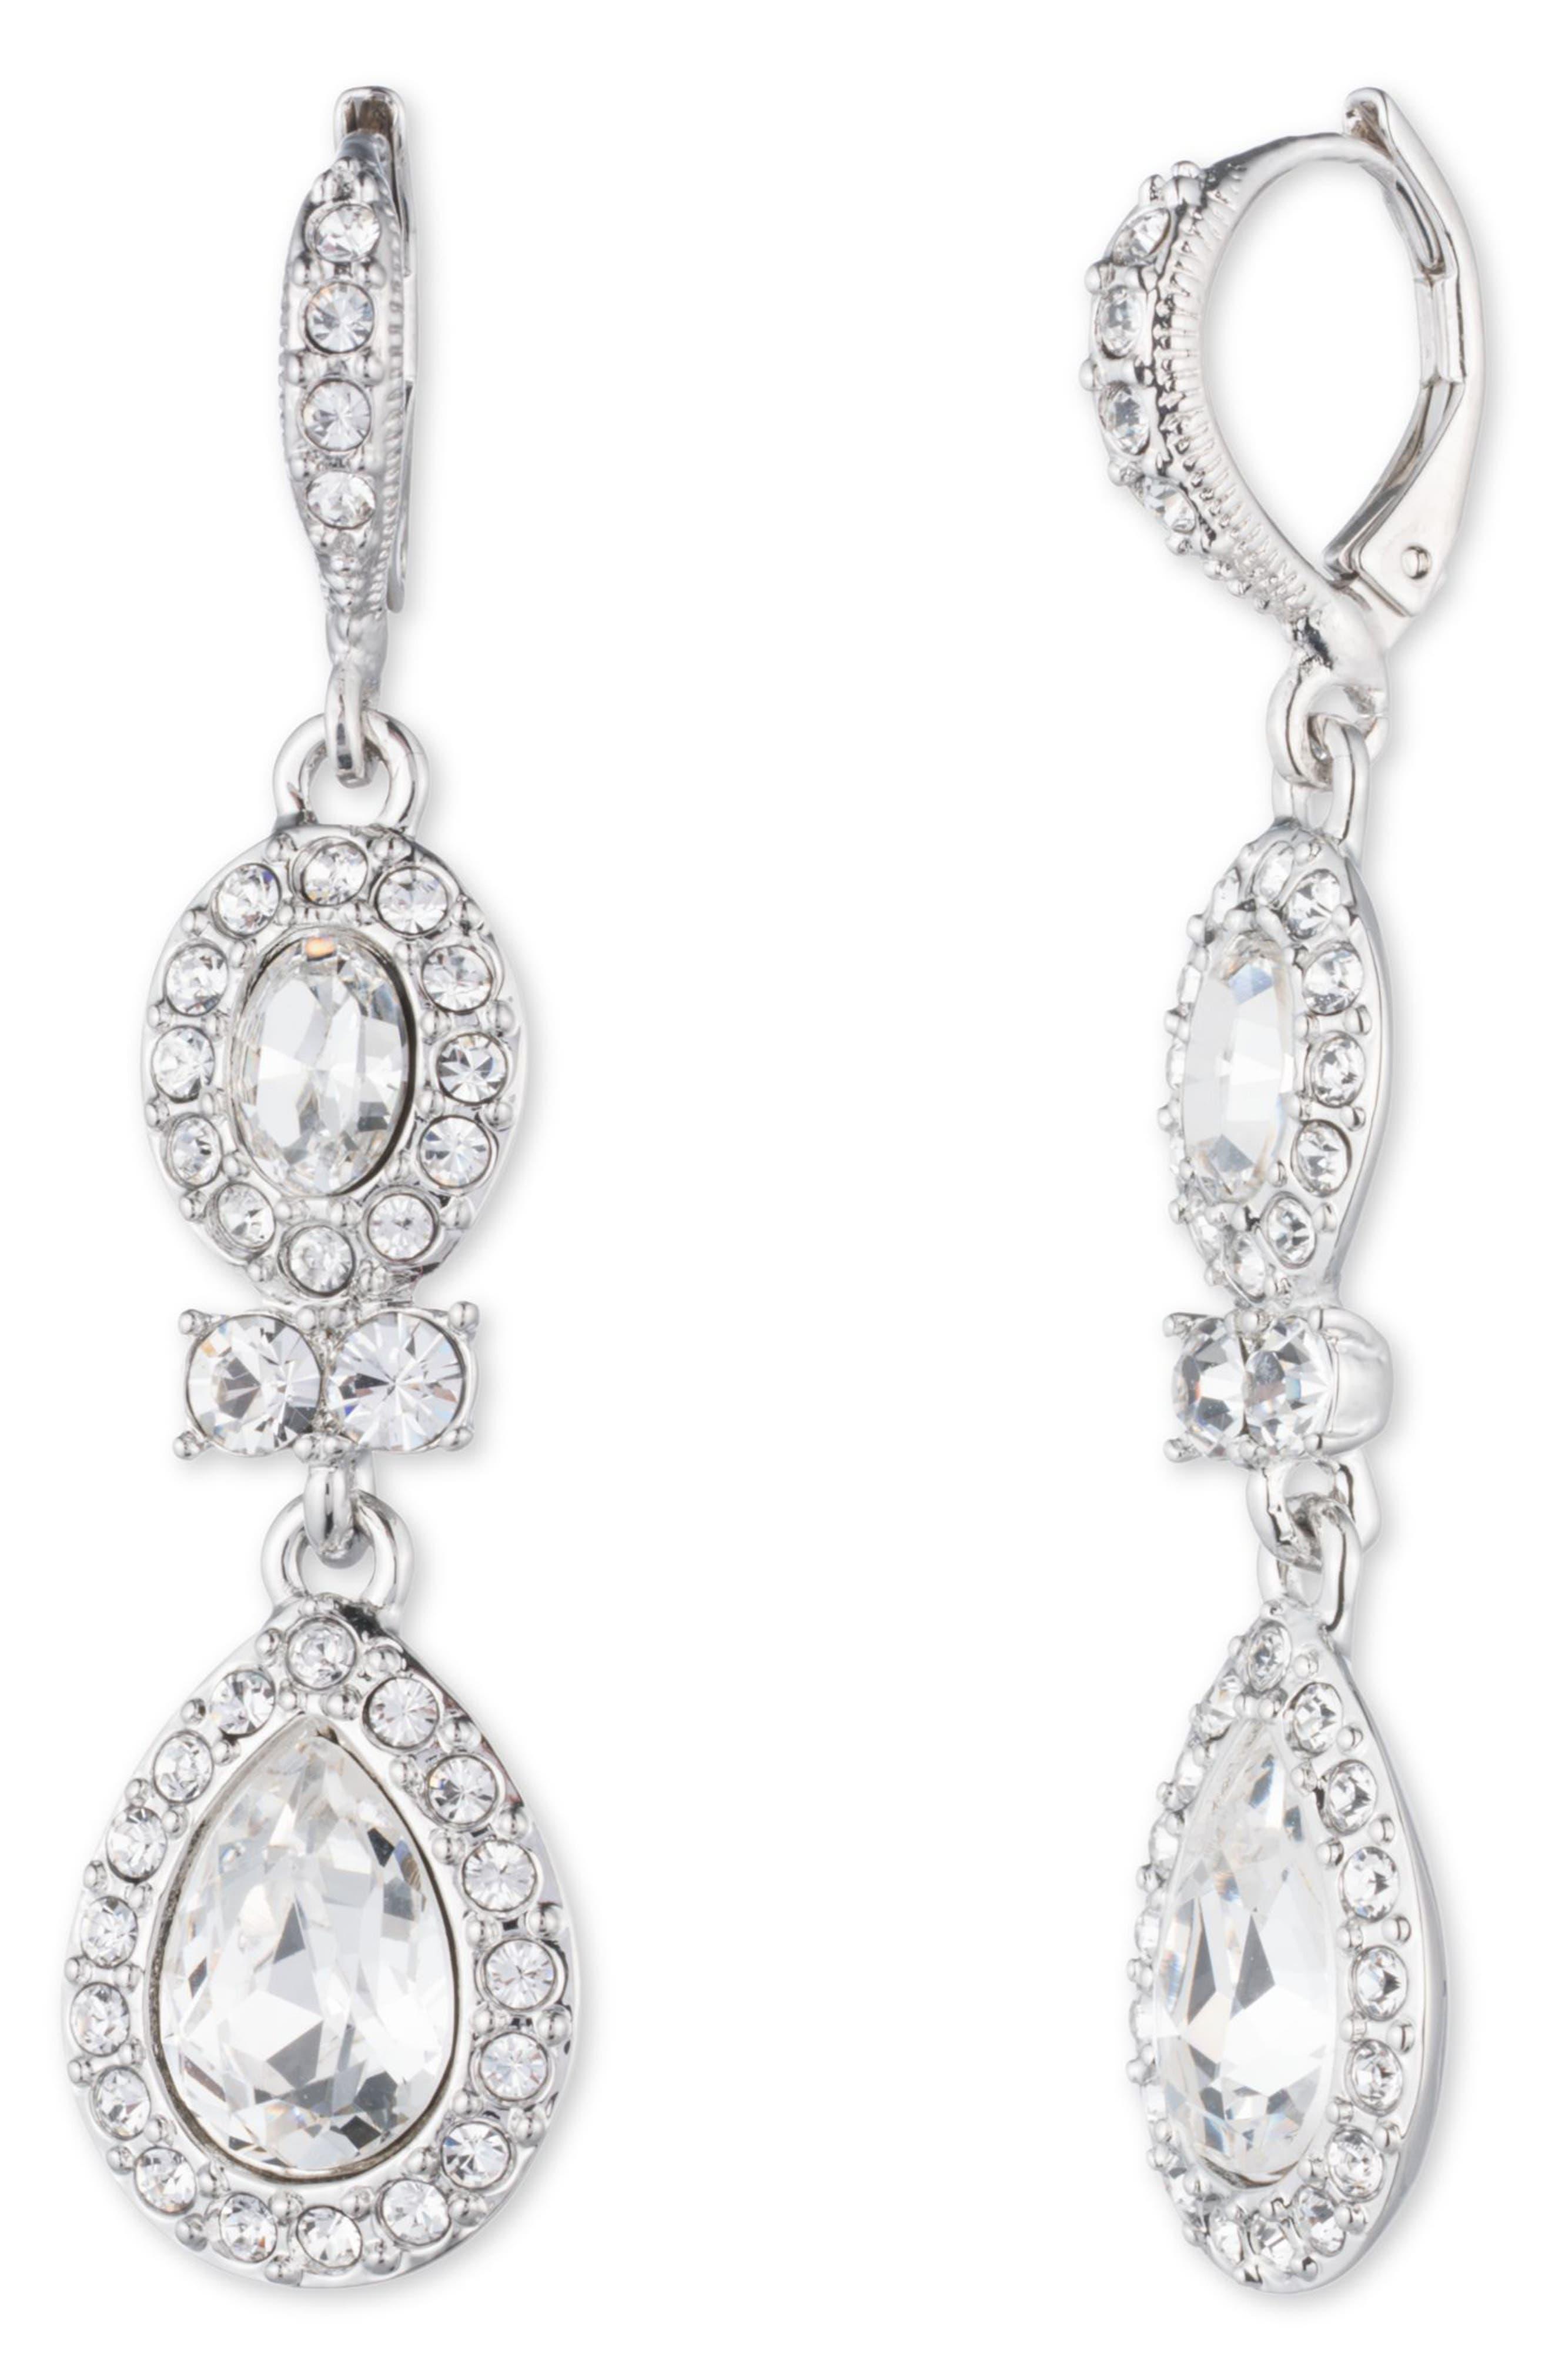 Pear Double Drop Earrings,                             Main thumbnail 1, color,                             040